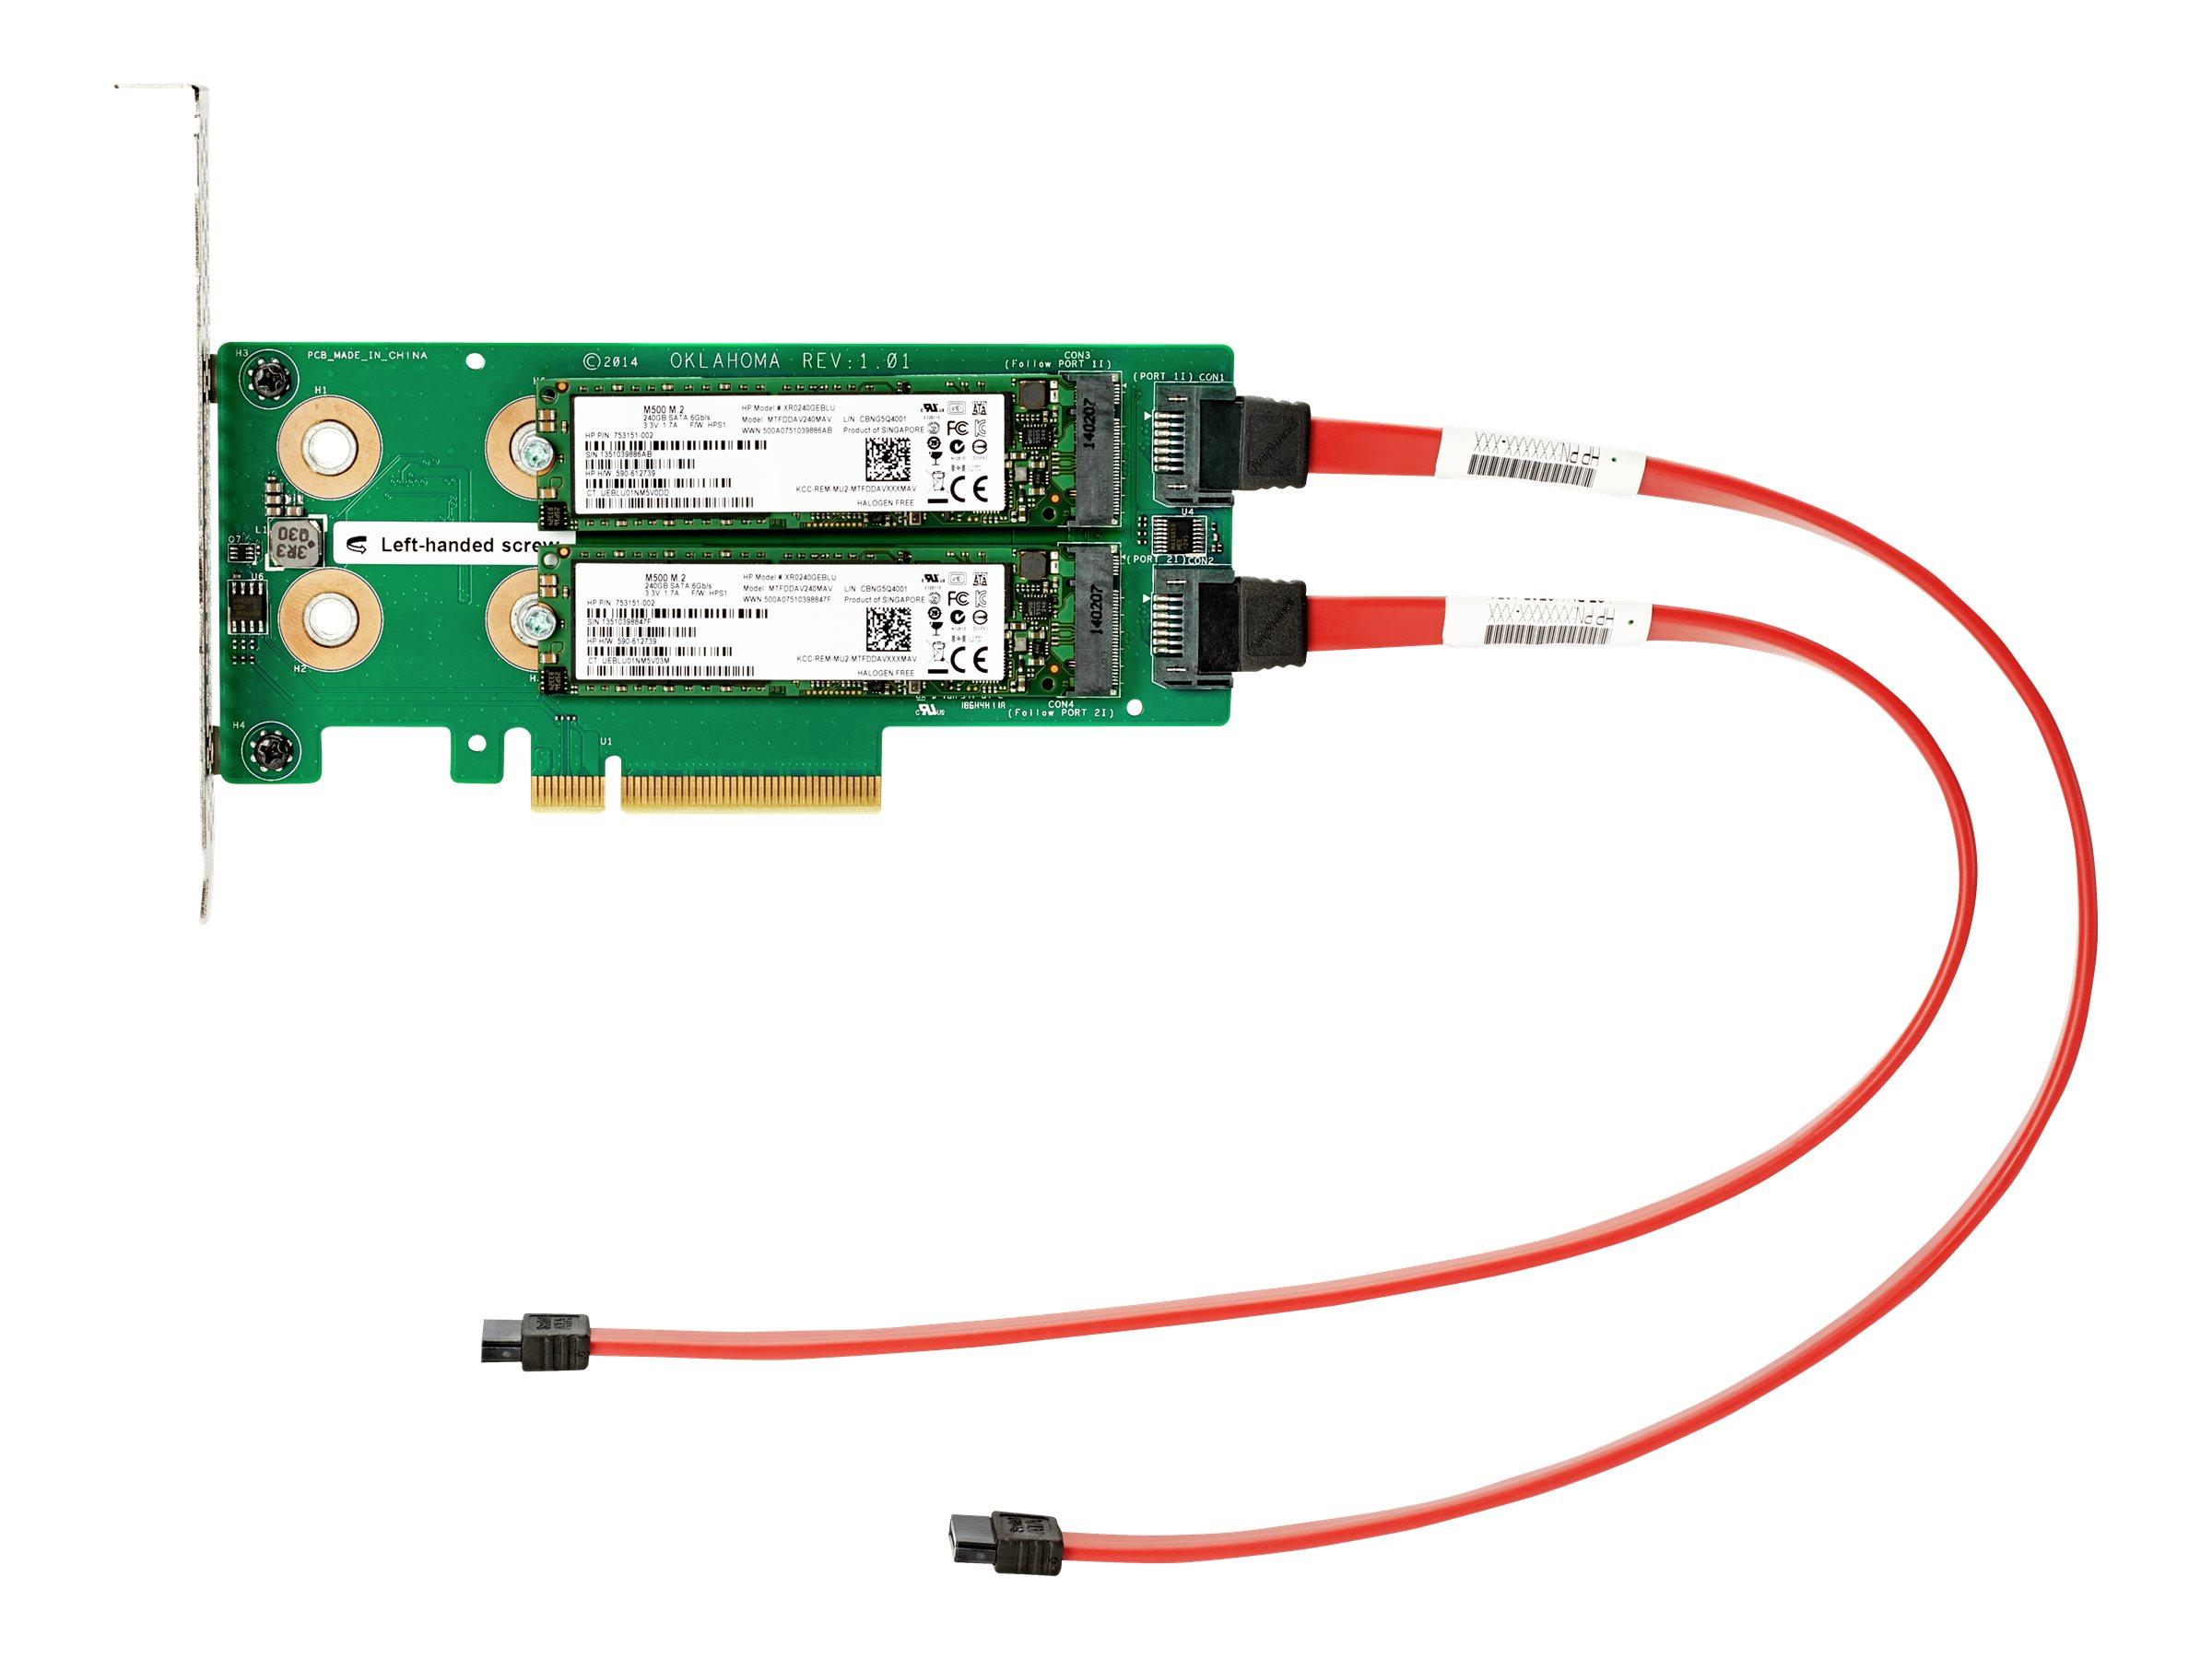 HPE Universal SATA HHHL M.2 Kit - interface adapter - M.2 Card - PCIe